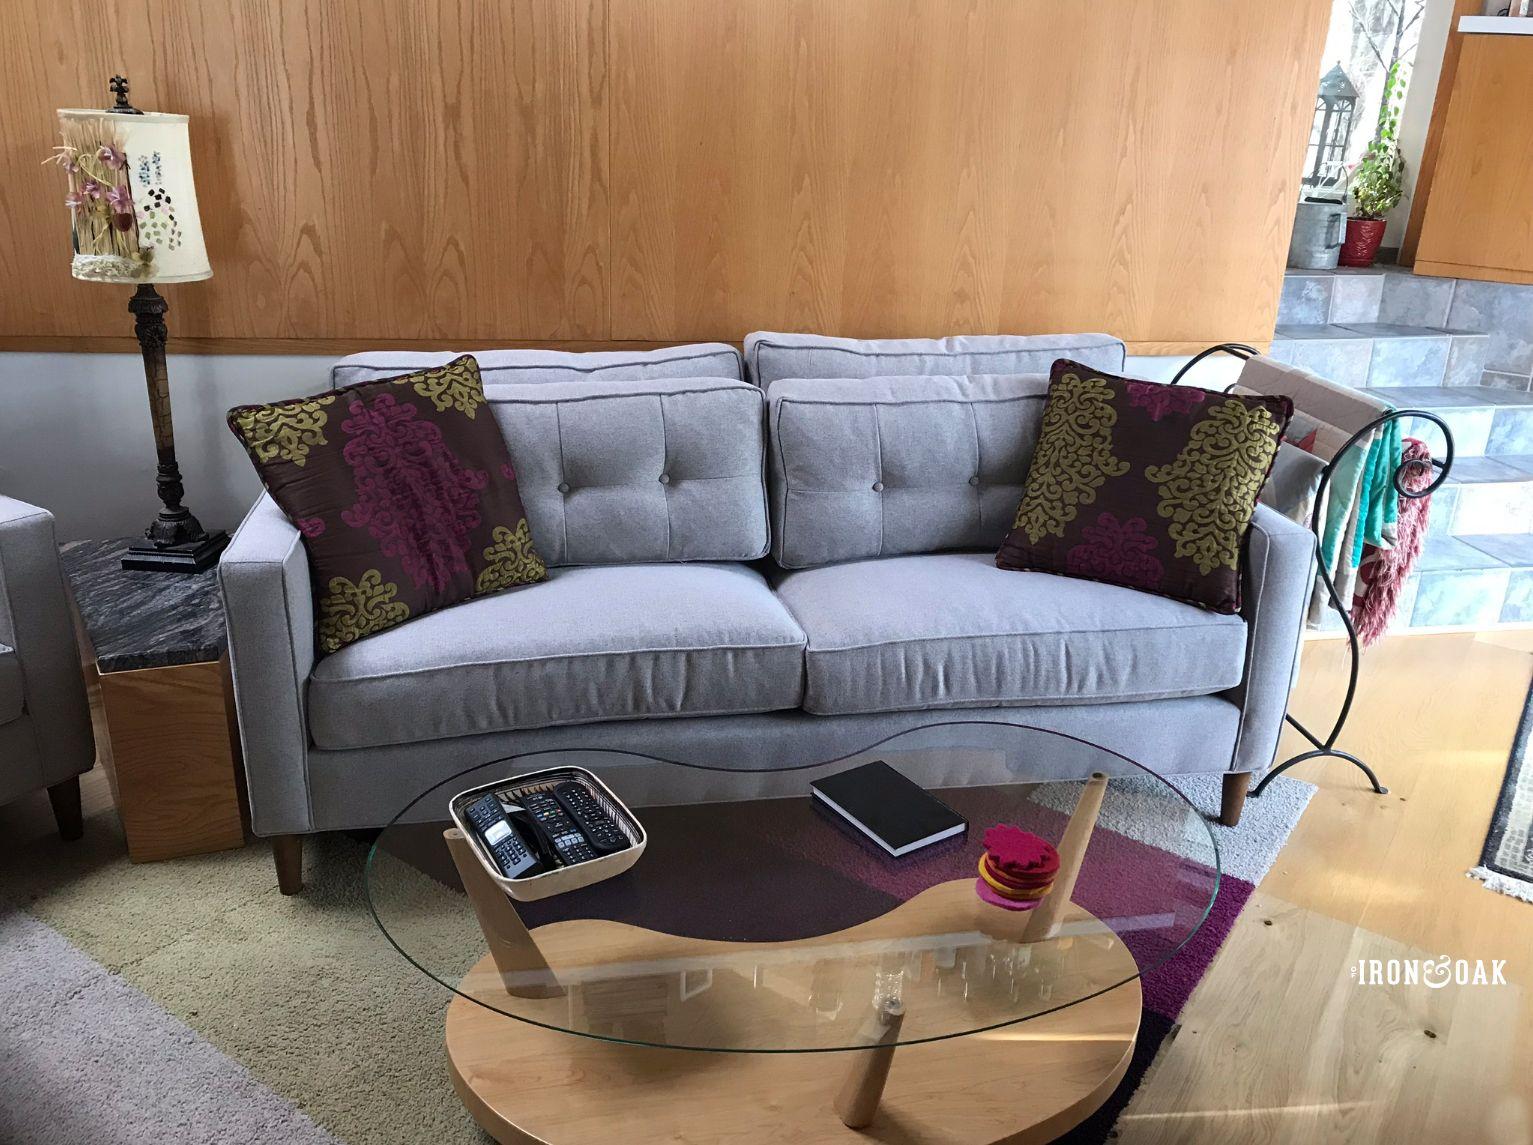 Enjoyable Mid Century Collection In 2019 Of Iron Oak Mid Century Theyellowbook Wood Chair Design Ideas Theyellowbookinfo